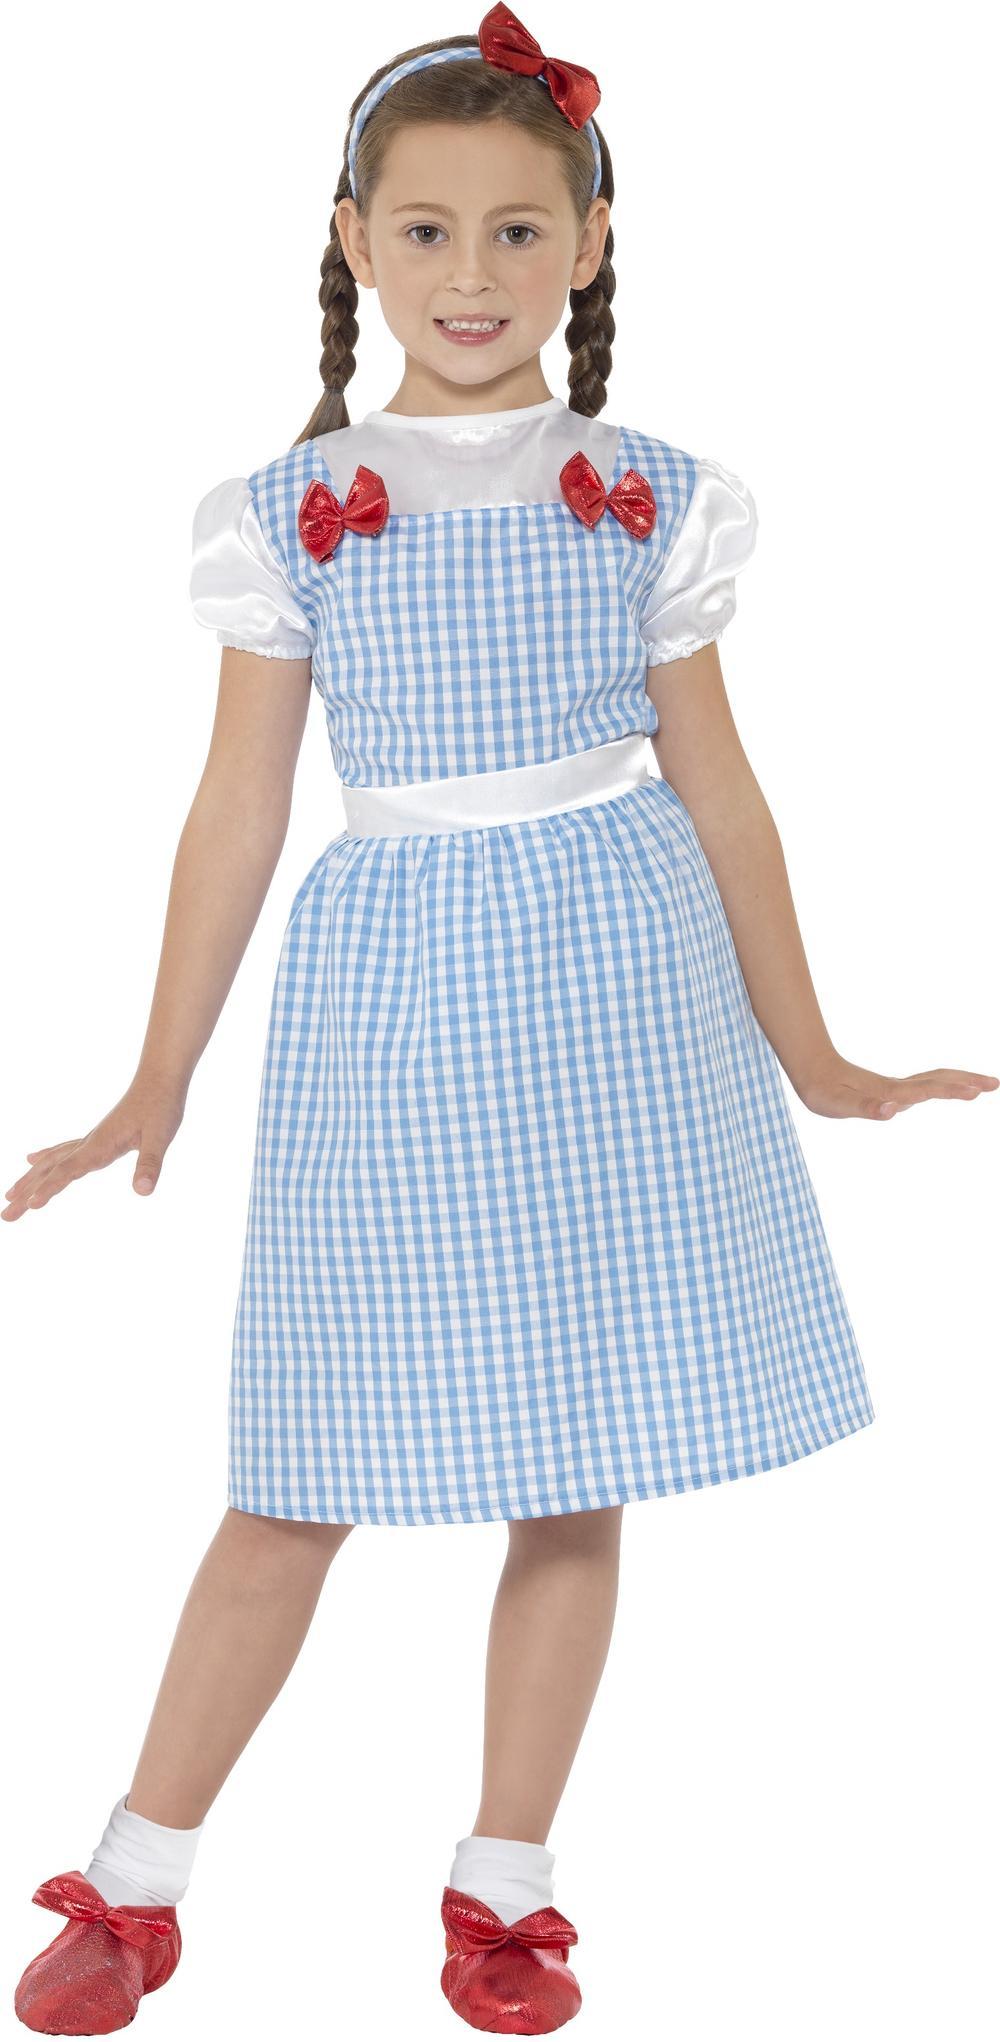 Girls Country Girl Costume